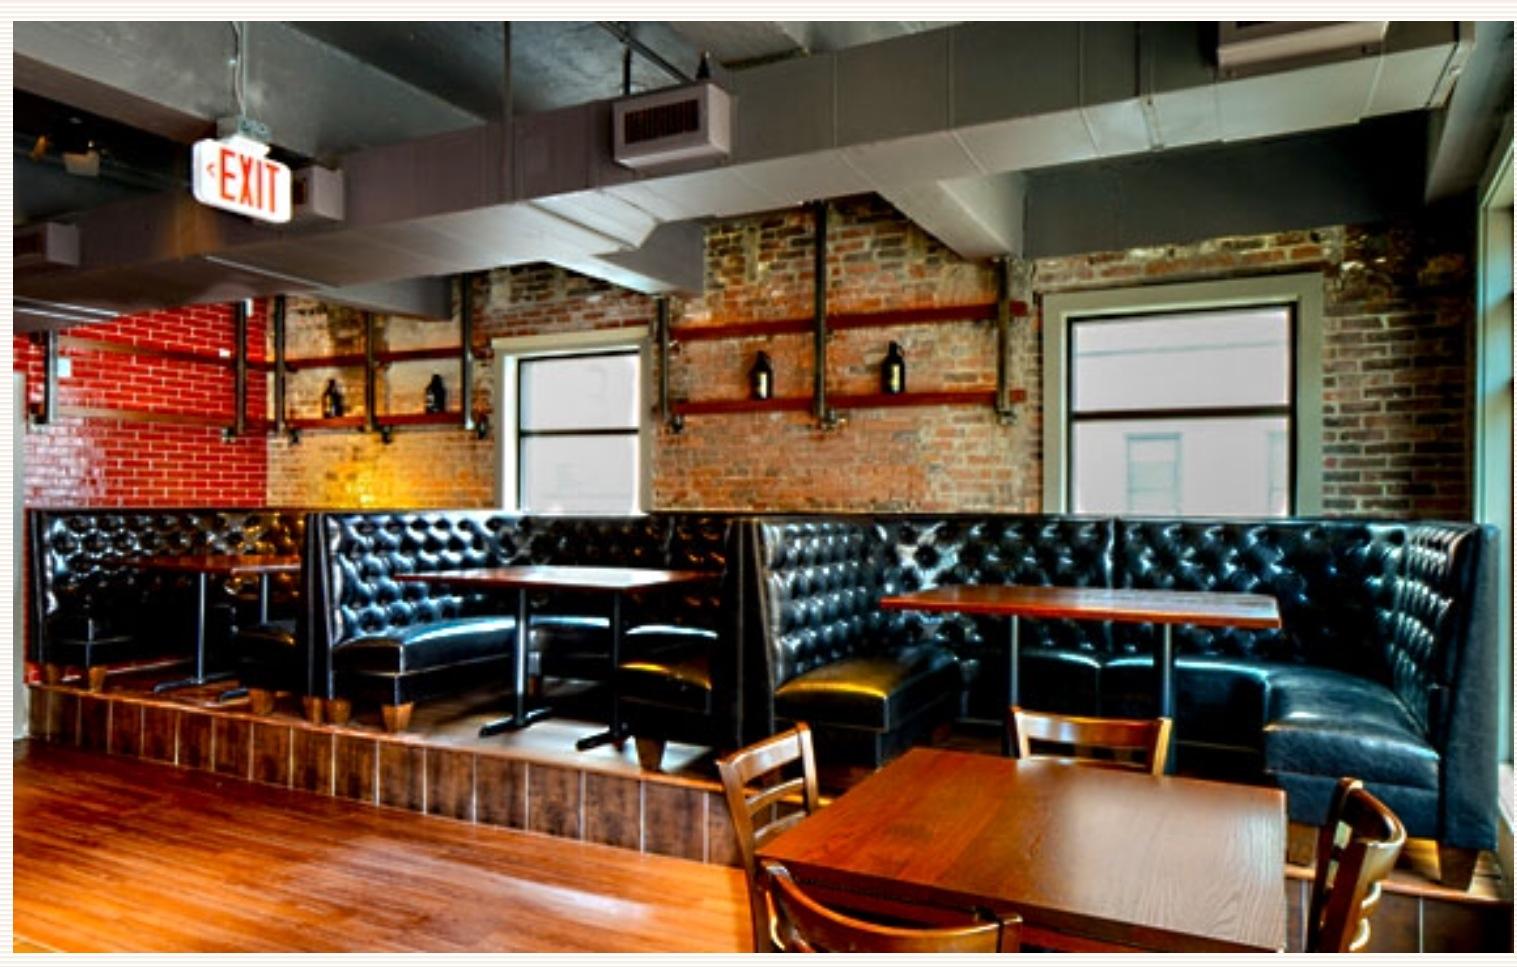 Causeway Restaurant & Bar NYE 2018 | Causeway Restaurant & Bar ...